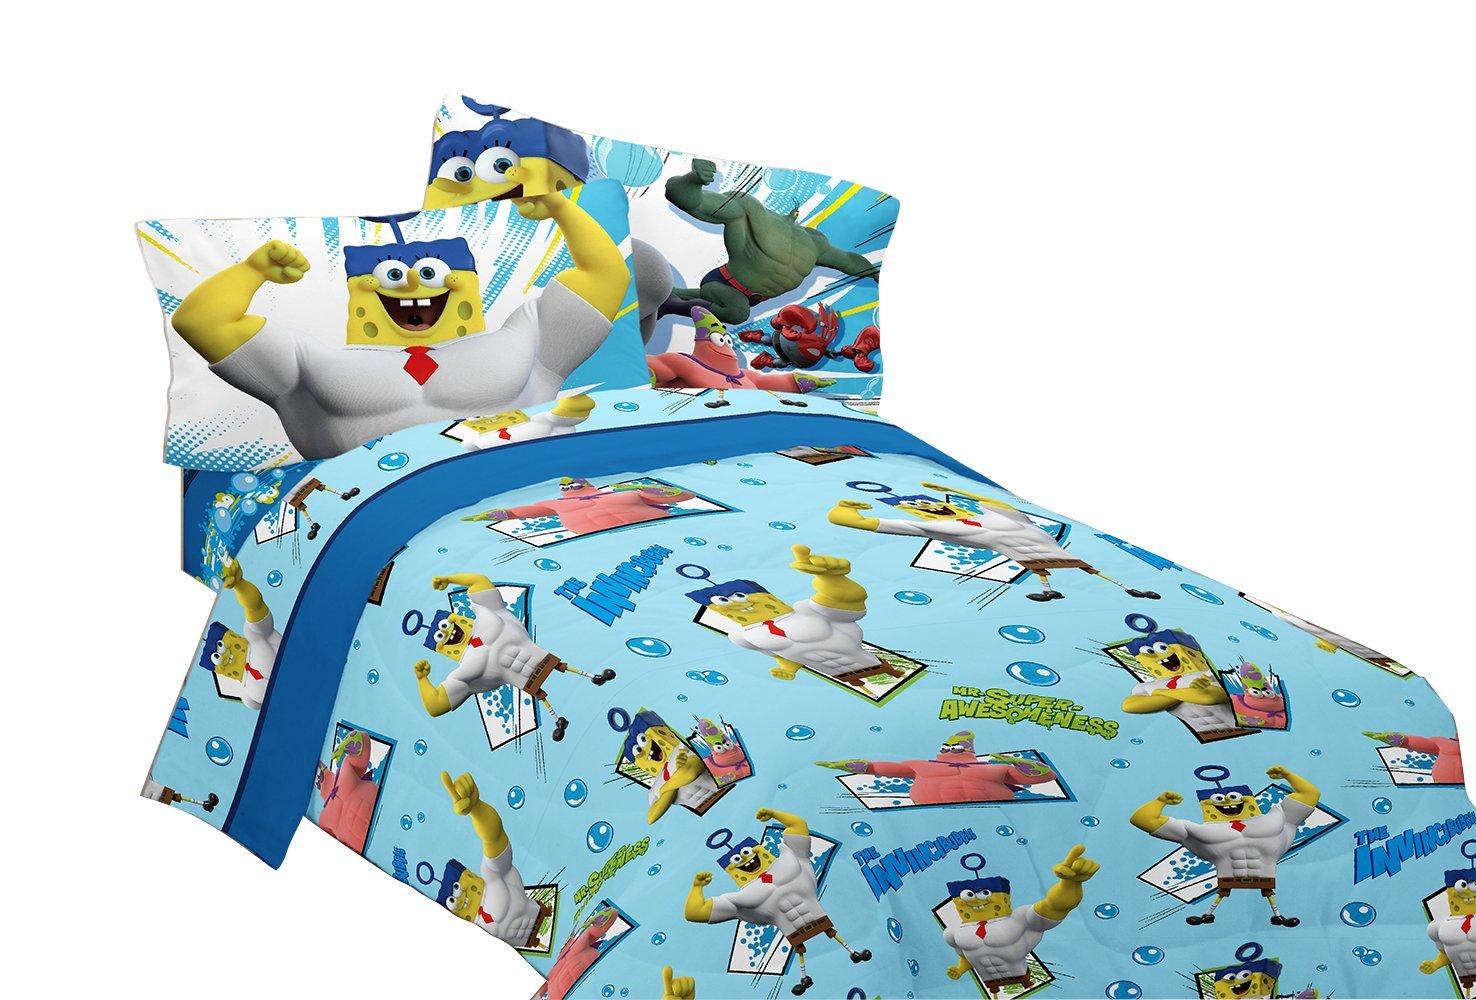 Nickelodeon Sponge Bob Mr. Awesome Twin Sheet Set